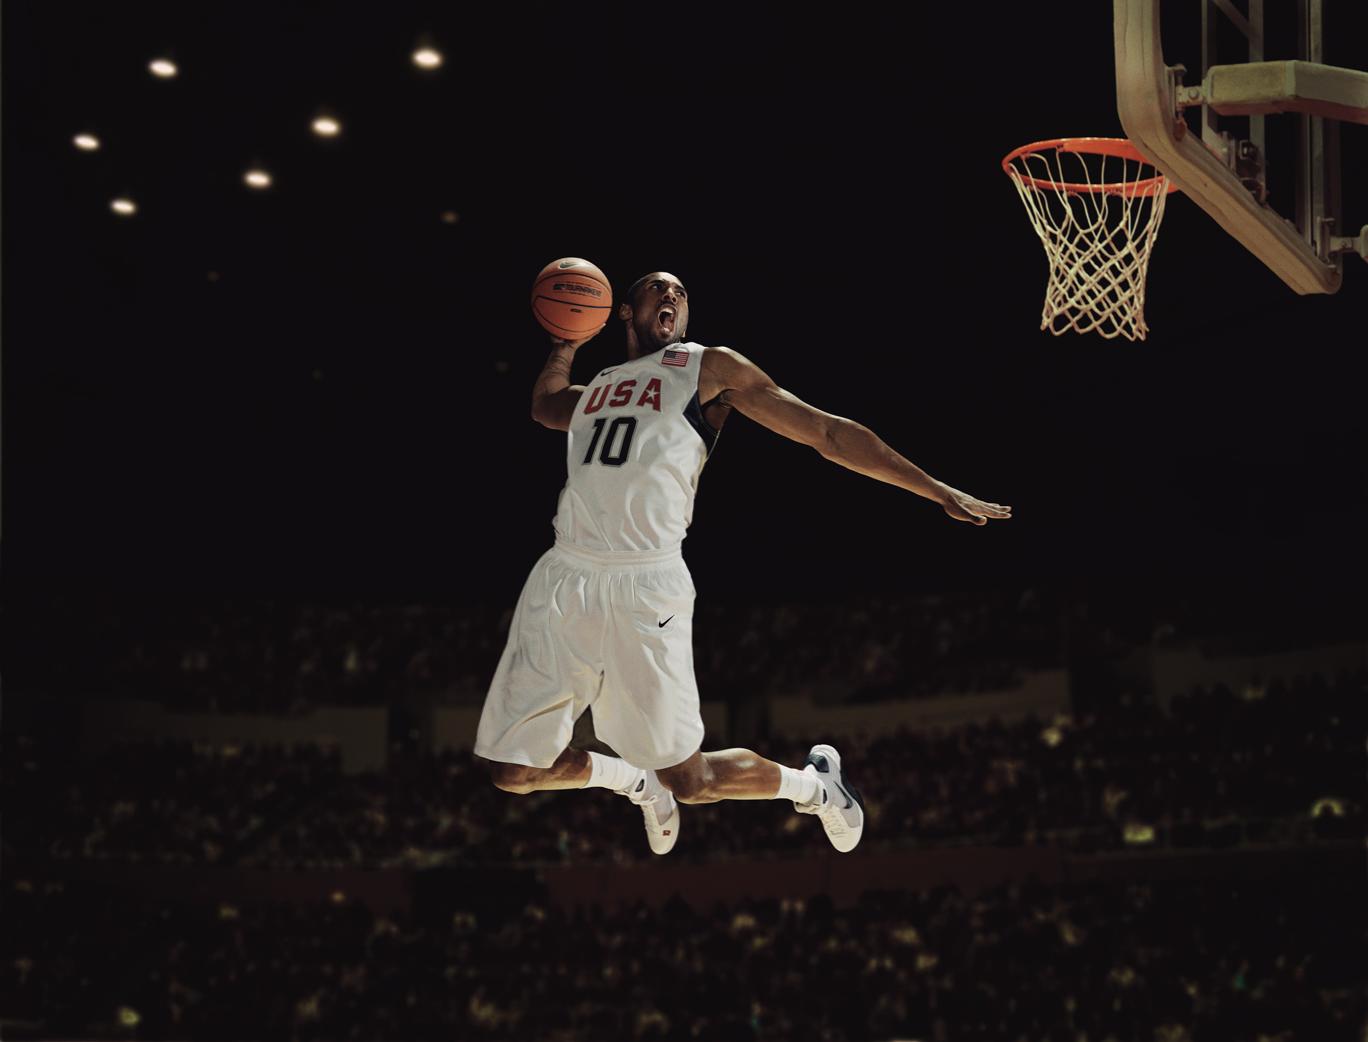 http://1.bp.blogspot.com/-loJSOTIp9QU/UG6m70j8JQI/AAAAAAAABWI/hYVWqbf8ev0/s1600/Kobe-Bryant-Slam-Dunk-Wallpaper.jpg